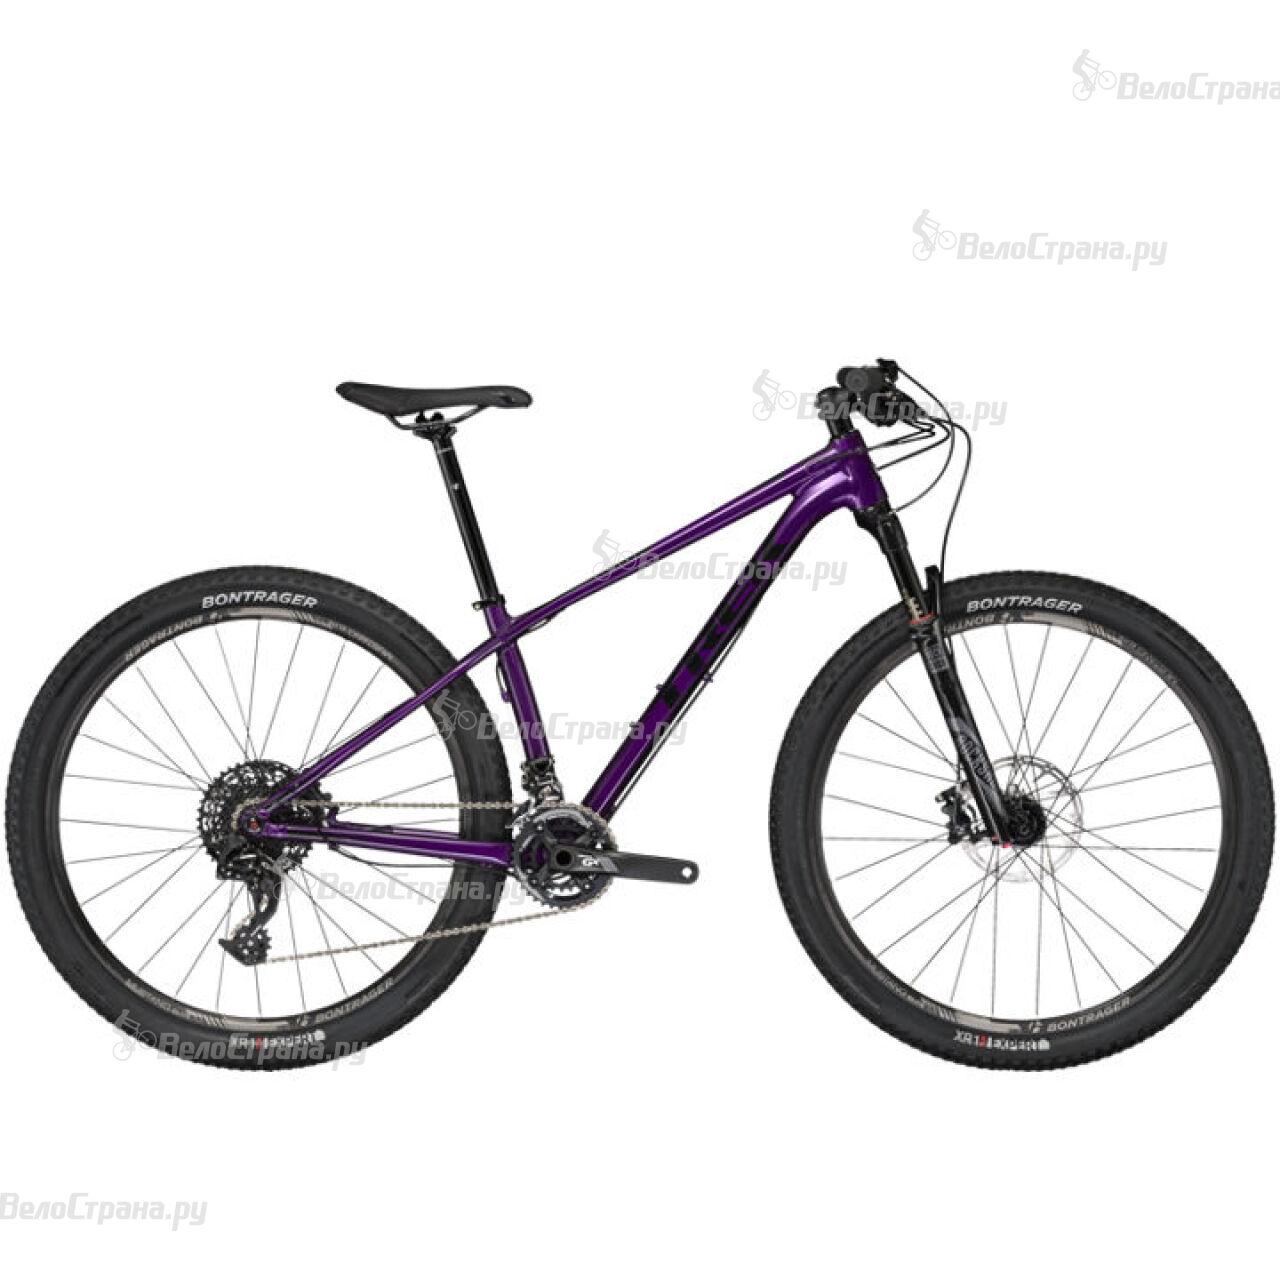 Велосипед Trek Superfly 6 WSD (2017) велосипед trek madone 3 1 wsd 2013